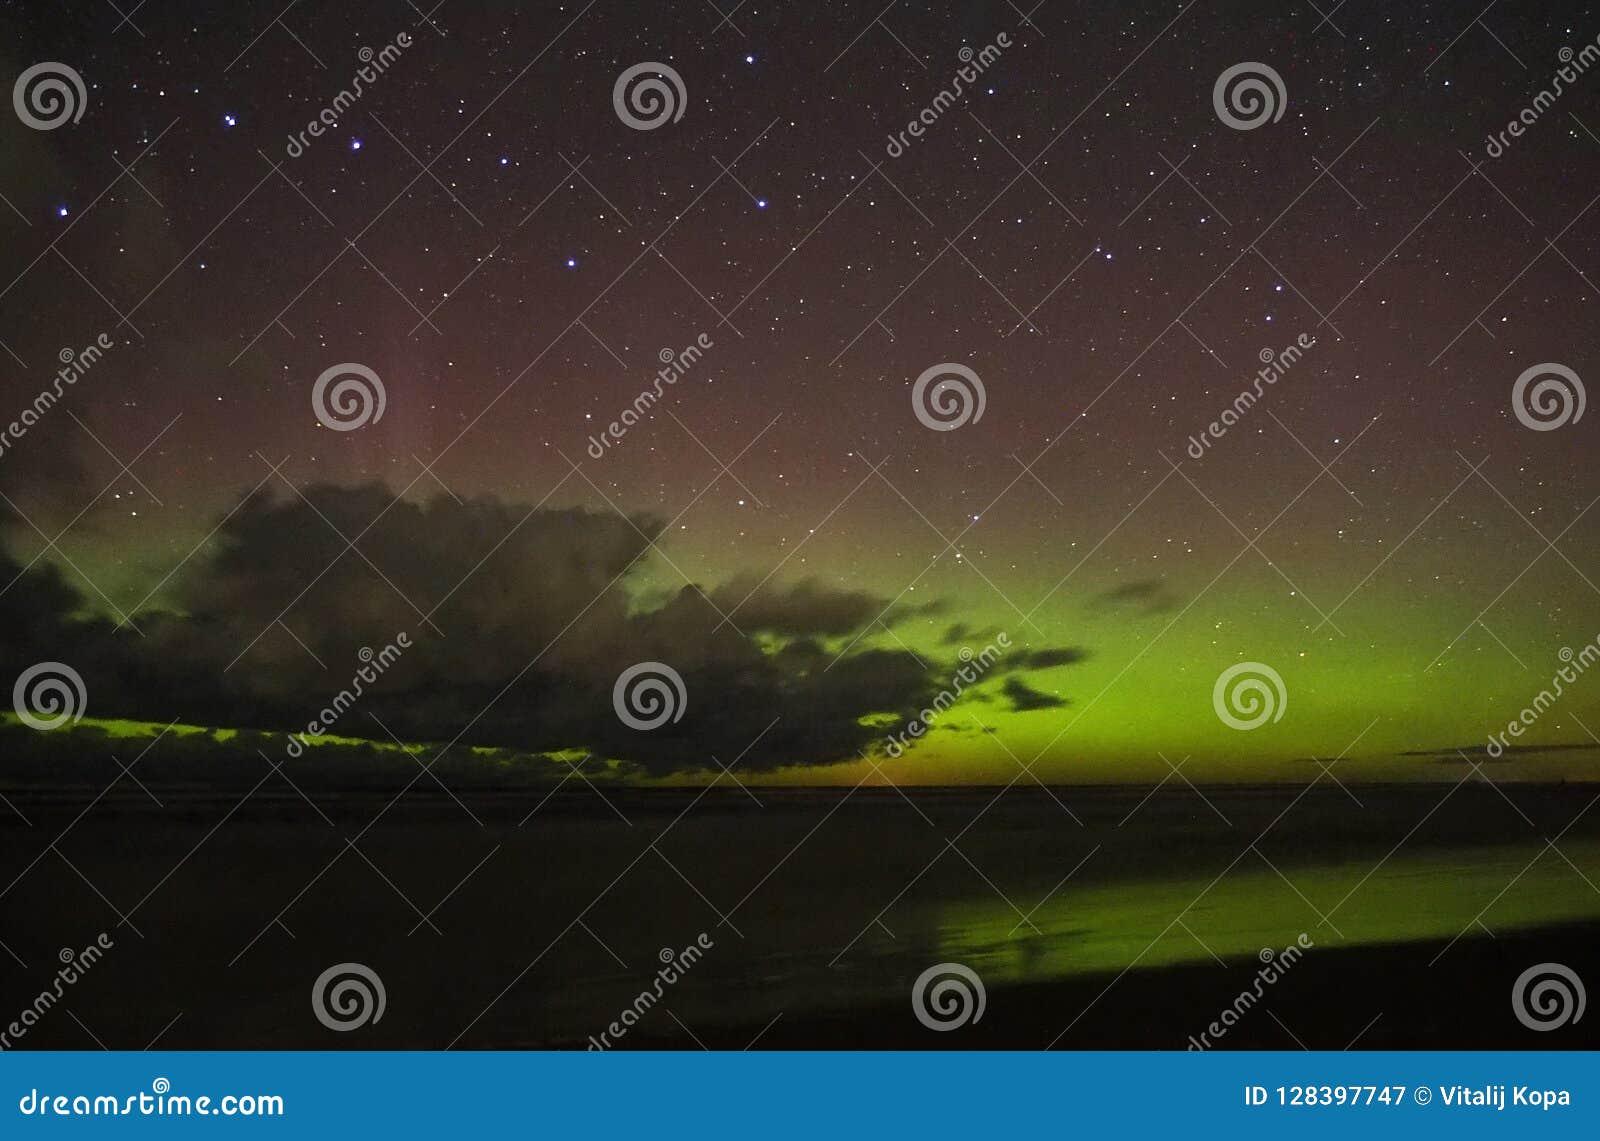 Clouds aurora polar lights big dipper constellation stars